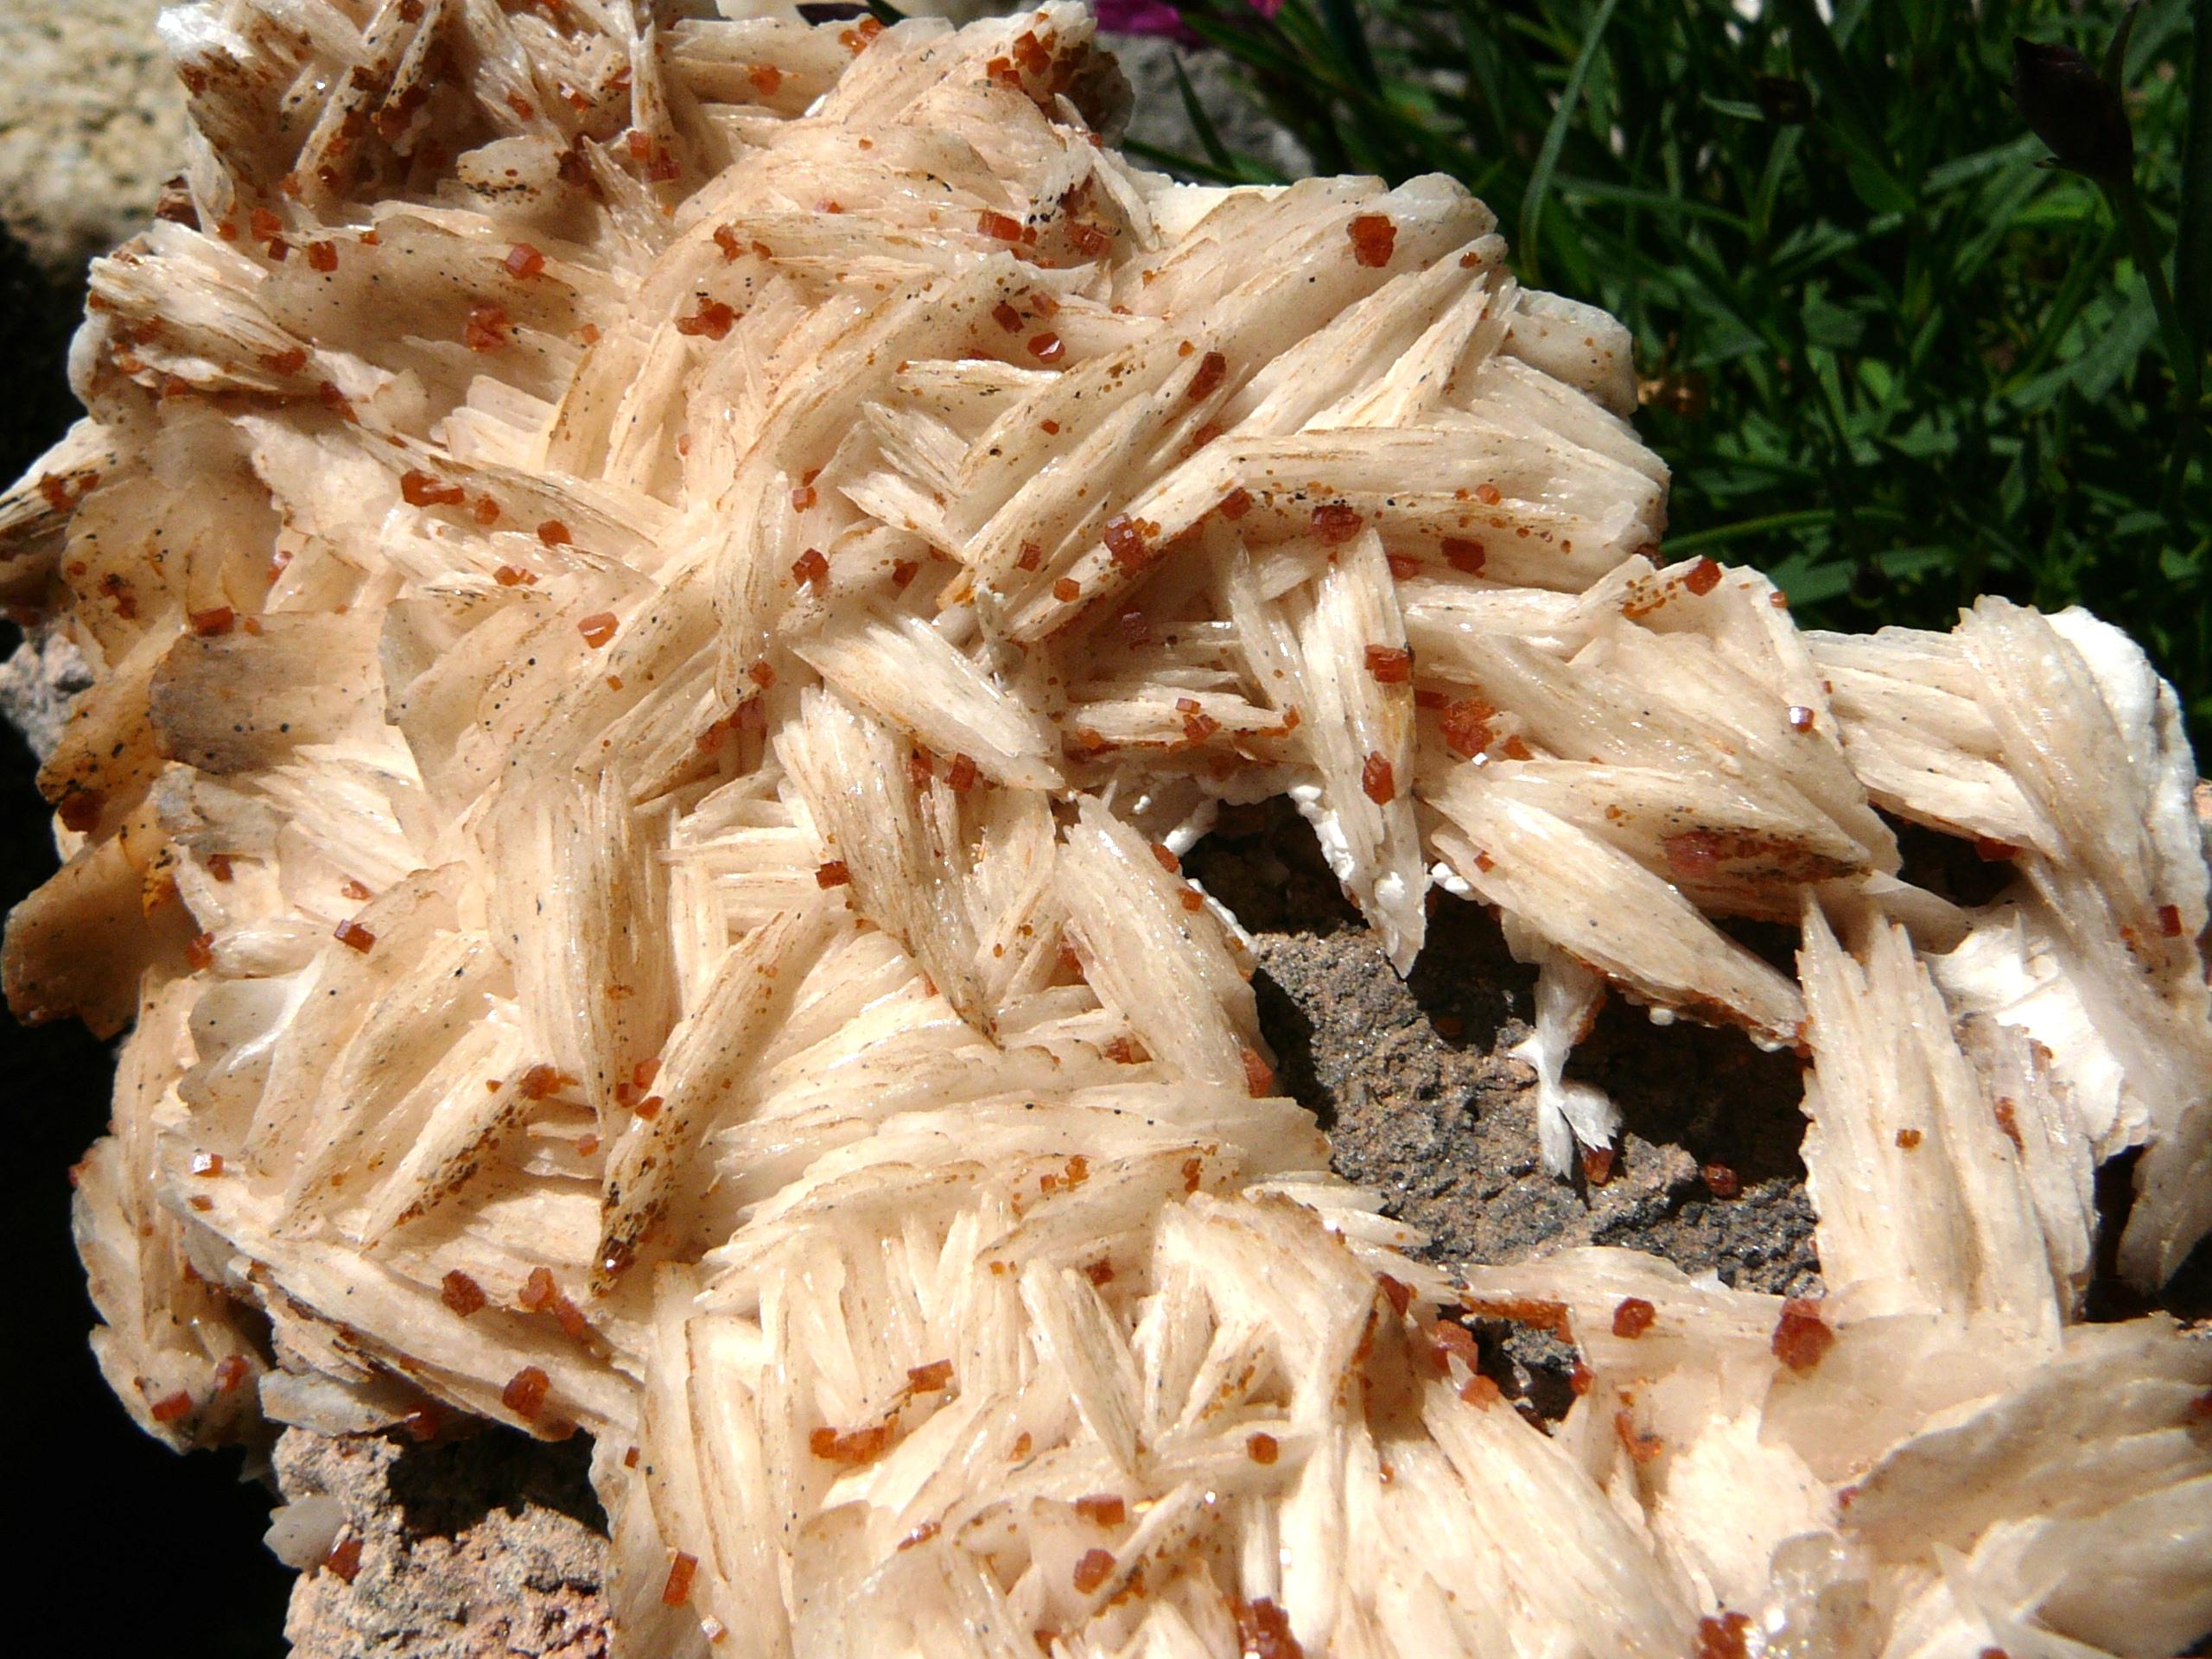 Barite with vanadinite crystals